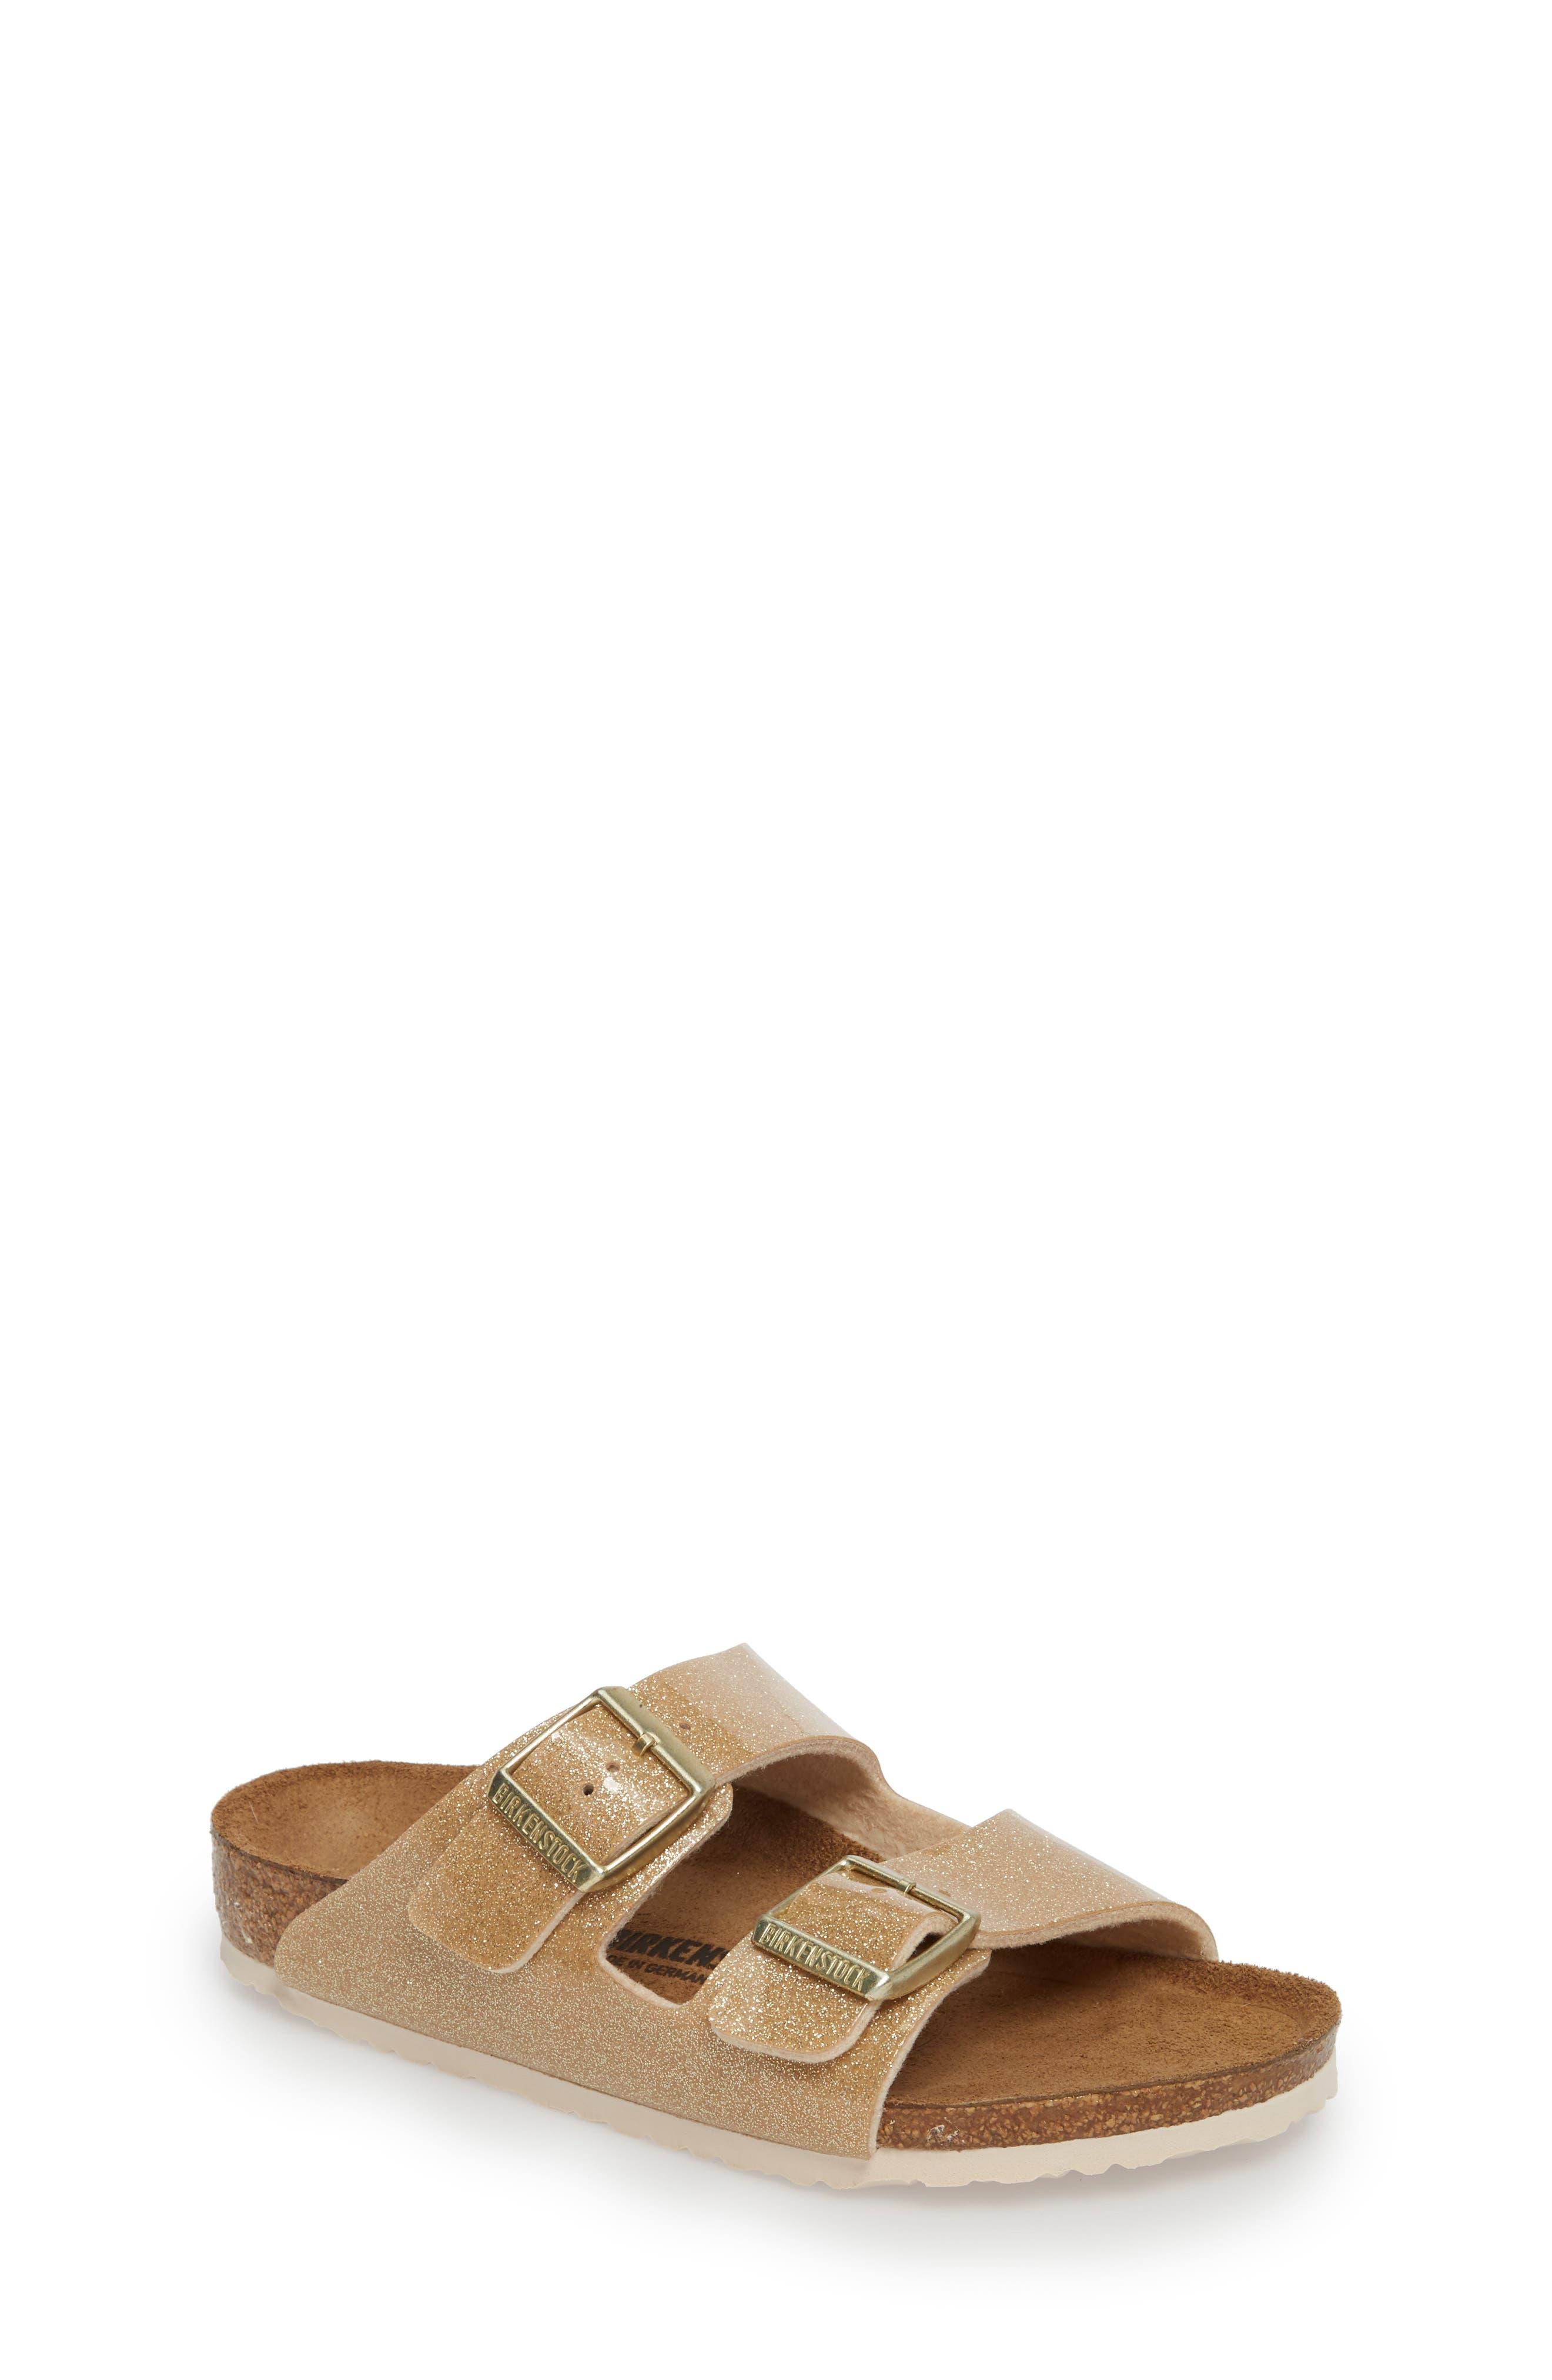 'Arizona Galaxy Birko-Flor' Slide Sandal,                             Main thumbnail 1, color,                             Galaxy Gold